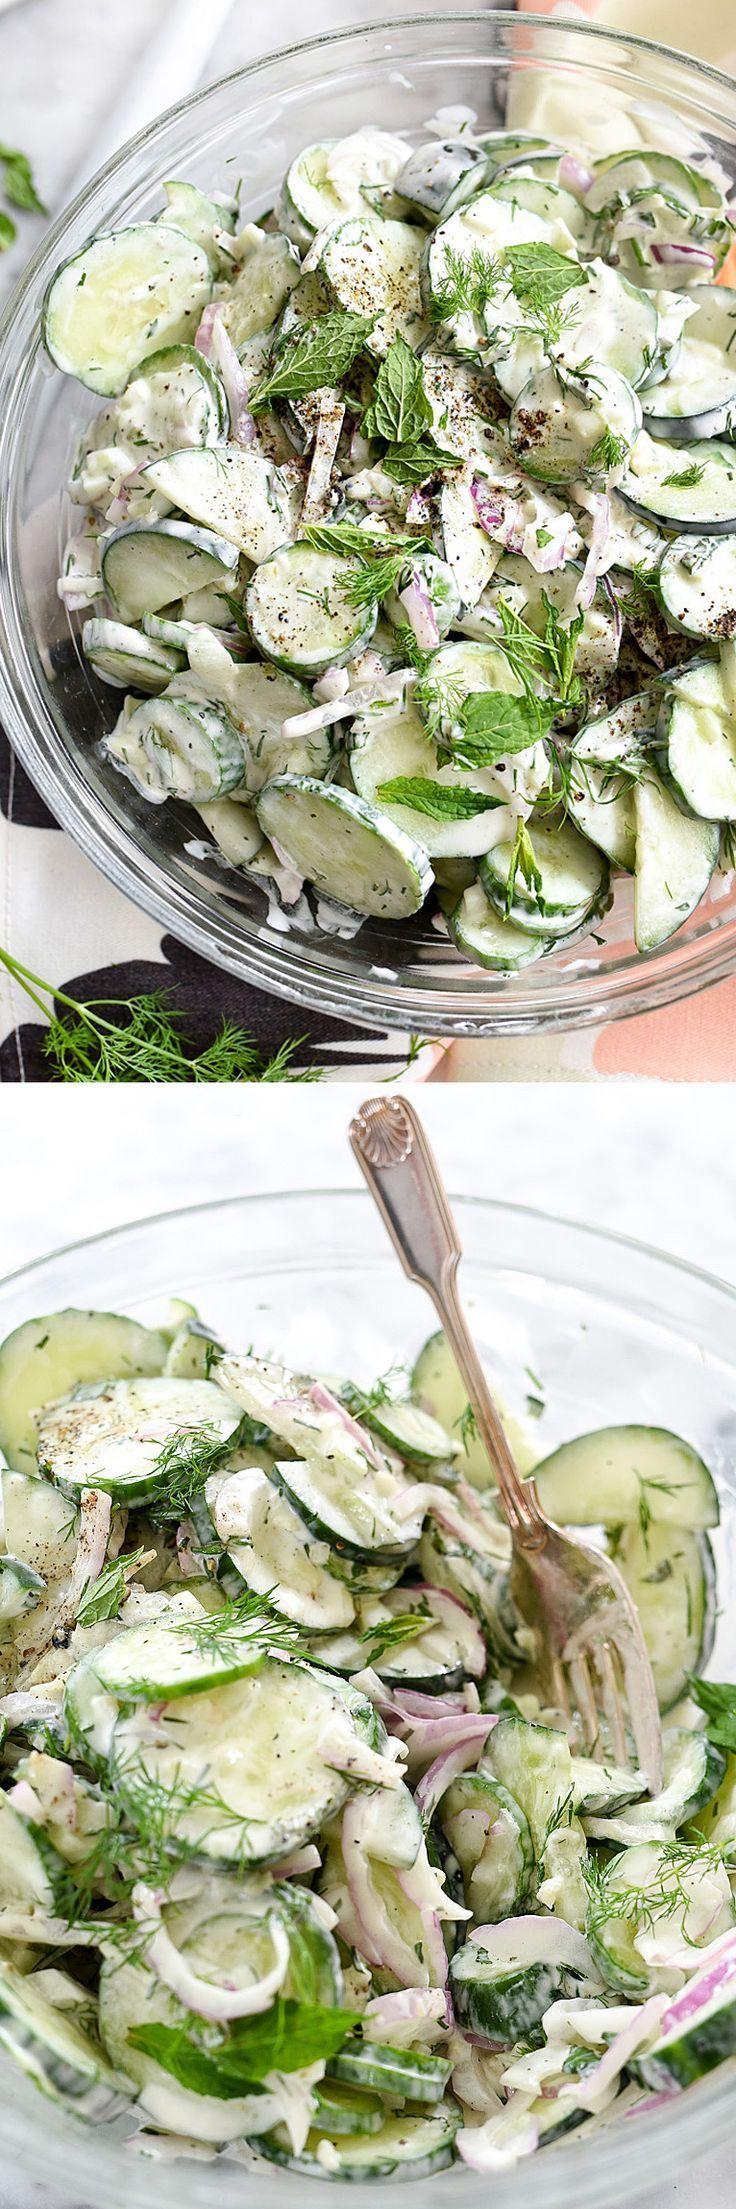 Creamy Yogurt and Cucumber Salad.